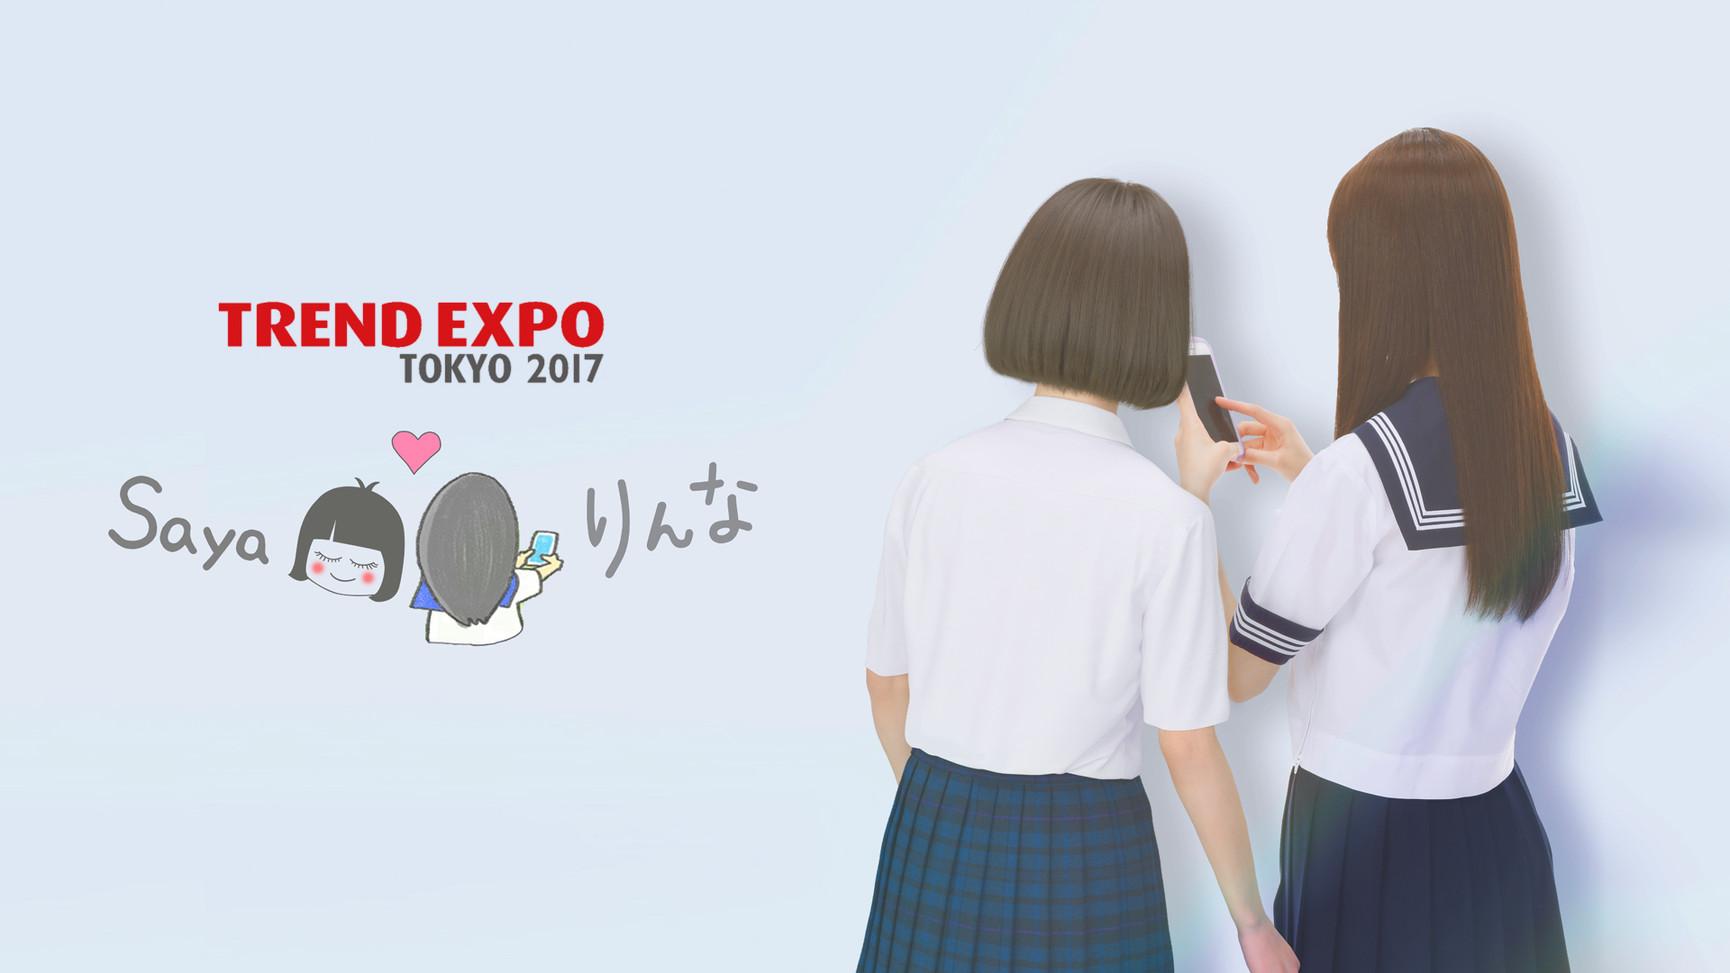 TREND EXPO TOKYO 2017